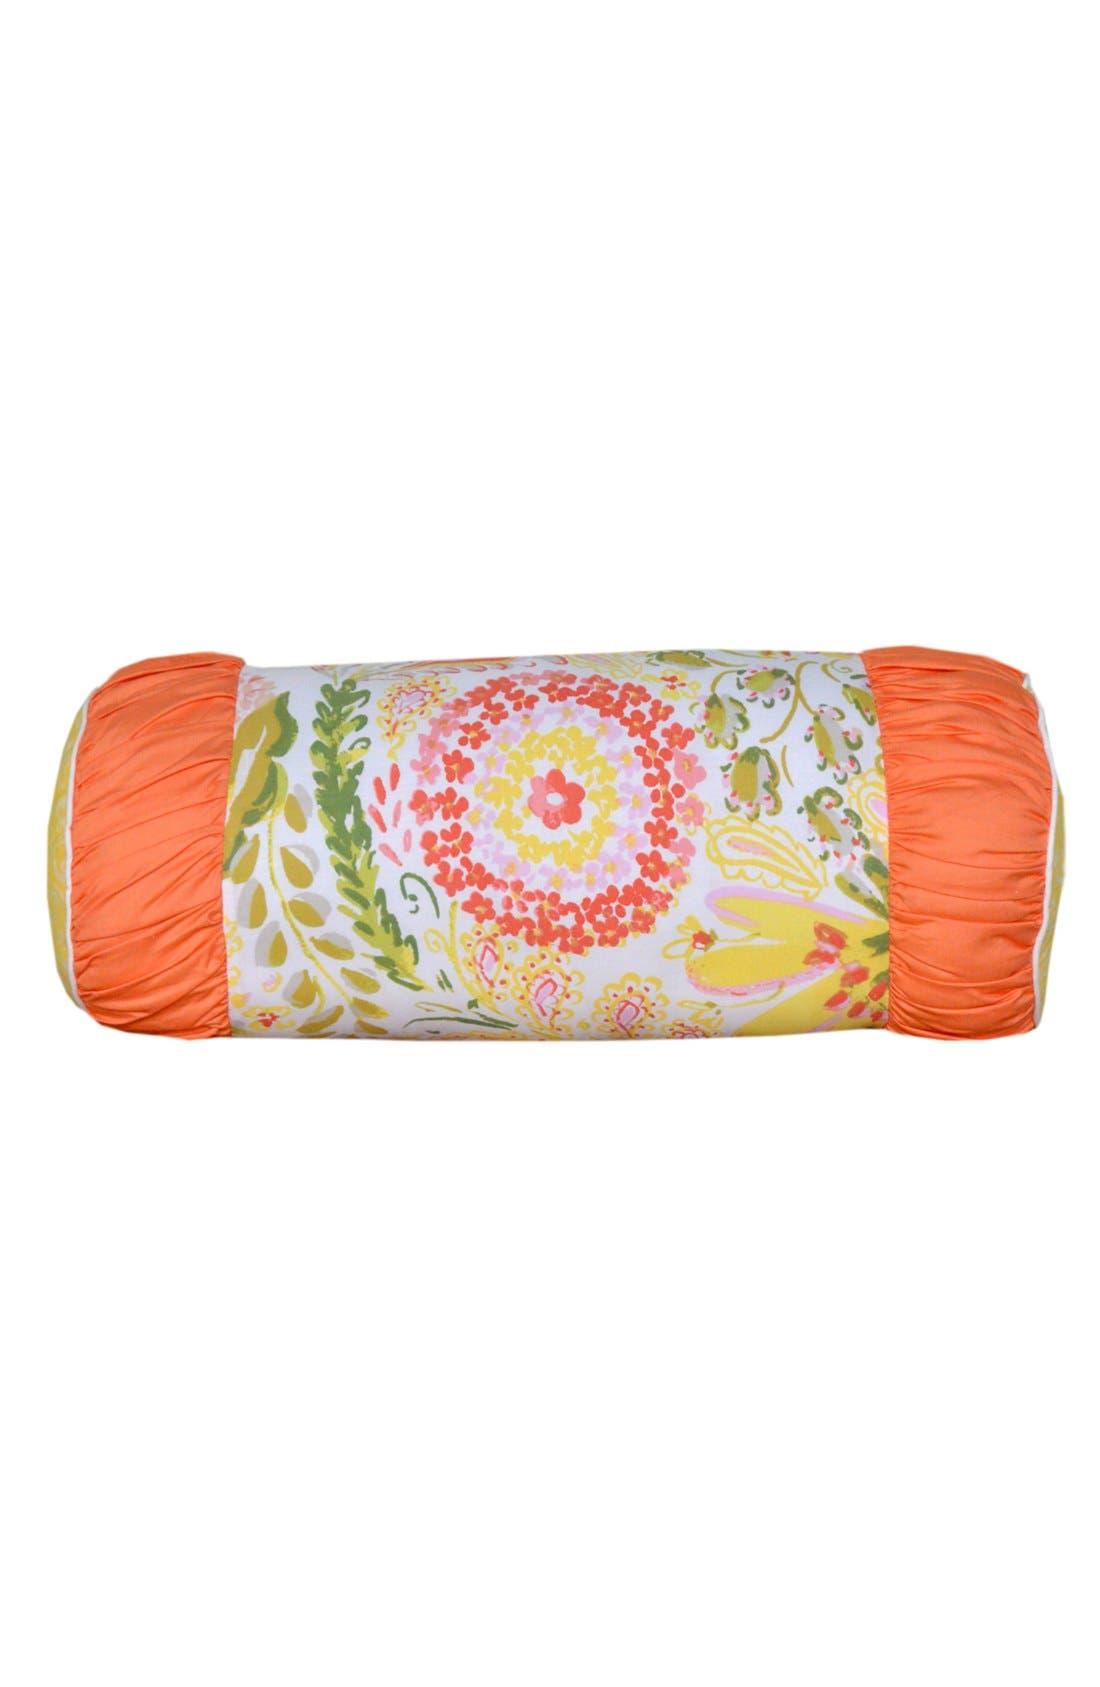 'Meadow' Bolster,                         Main,                         color, Orange/ Yellow